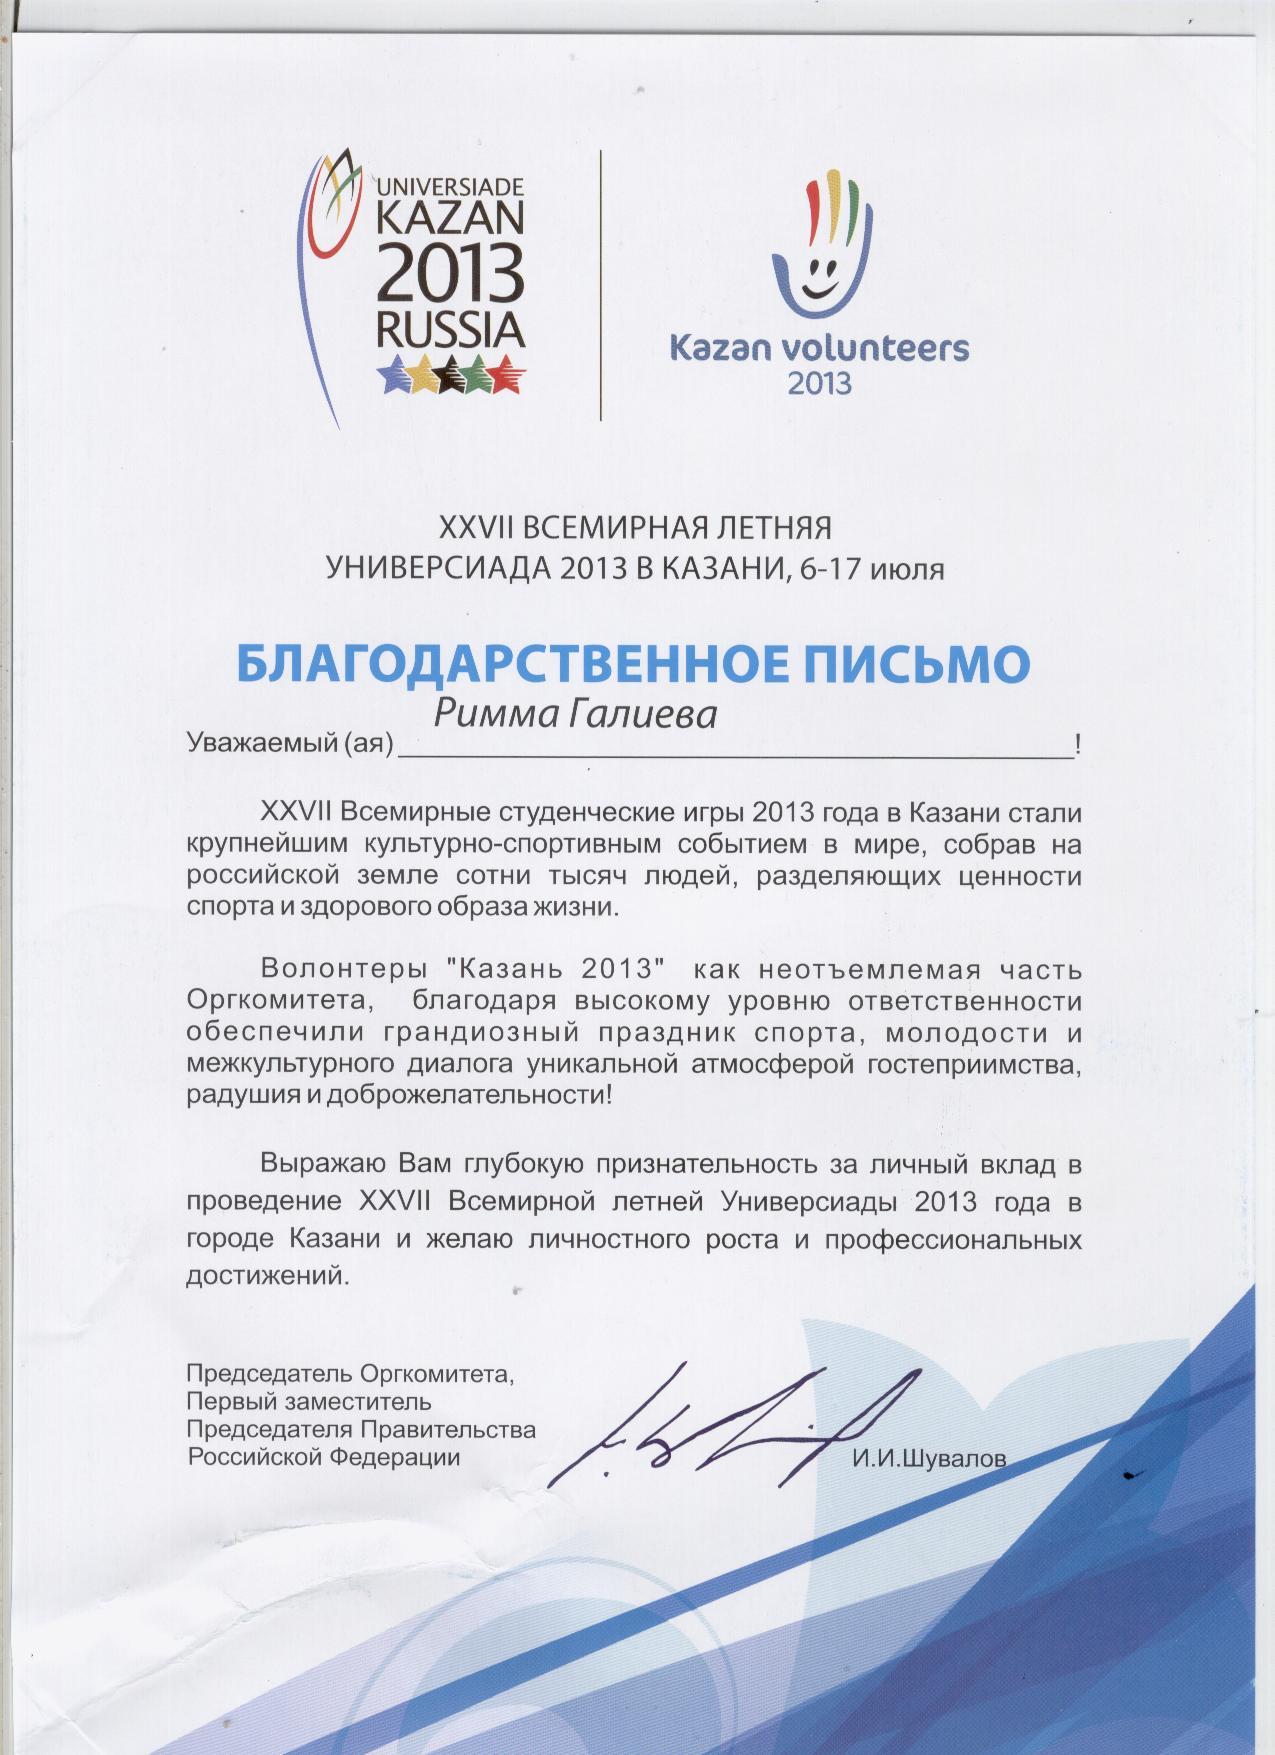 F:\Всероссйский конкурс Портфолио выпускника\РИММА\Римма 031.jpg